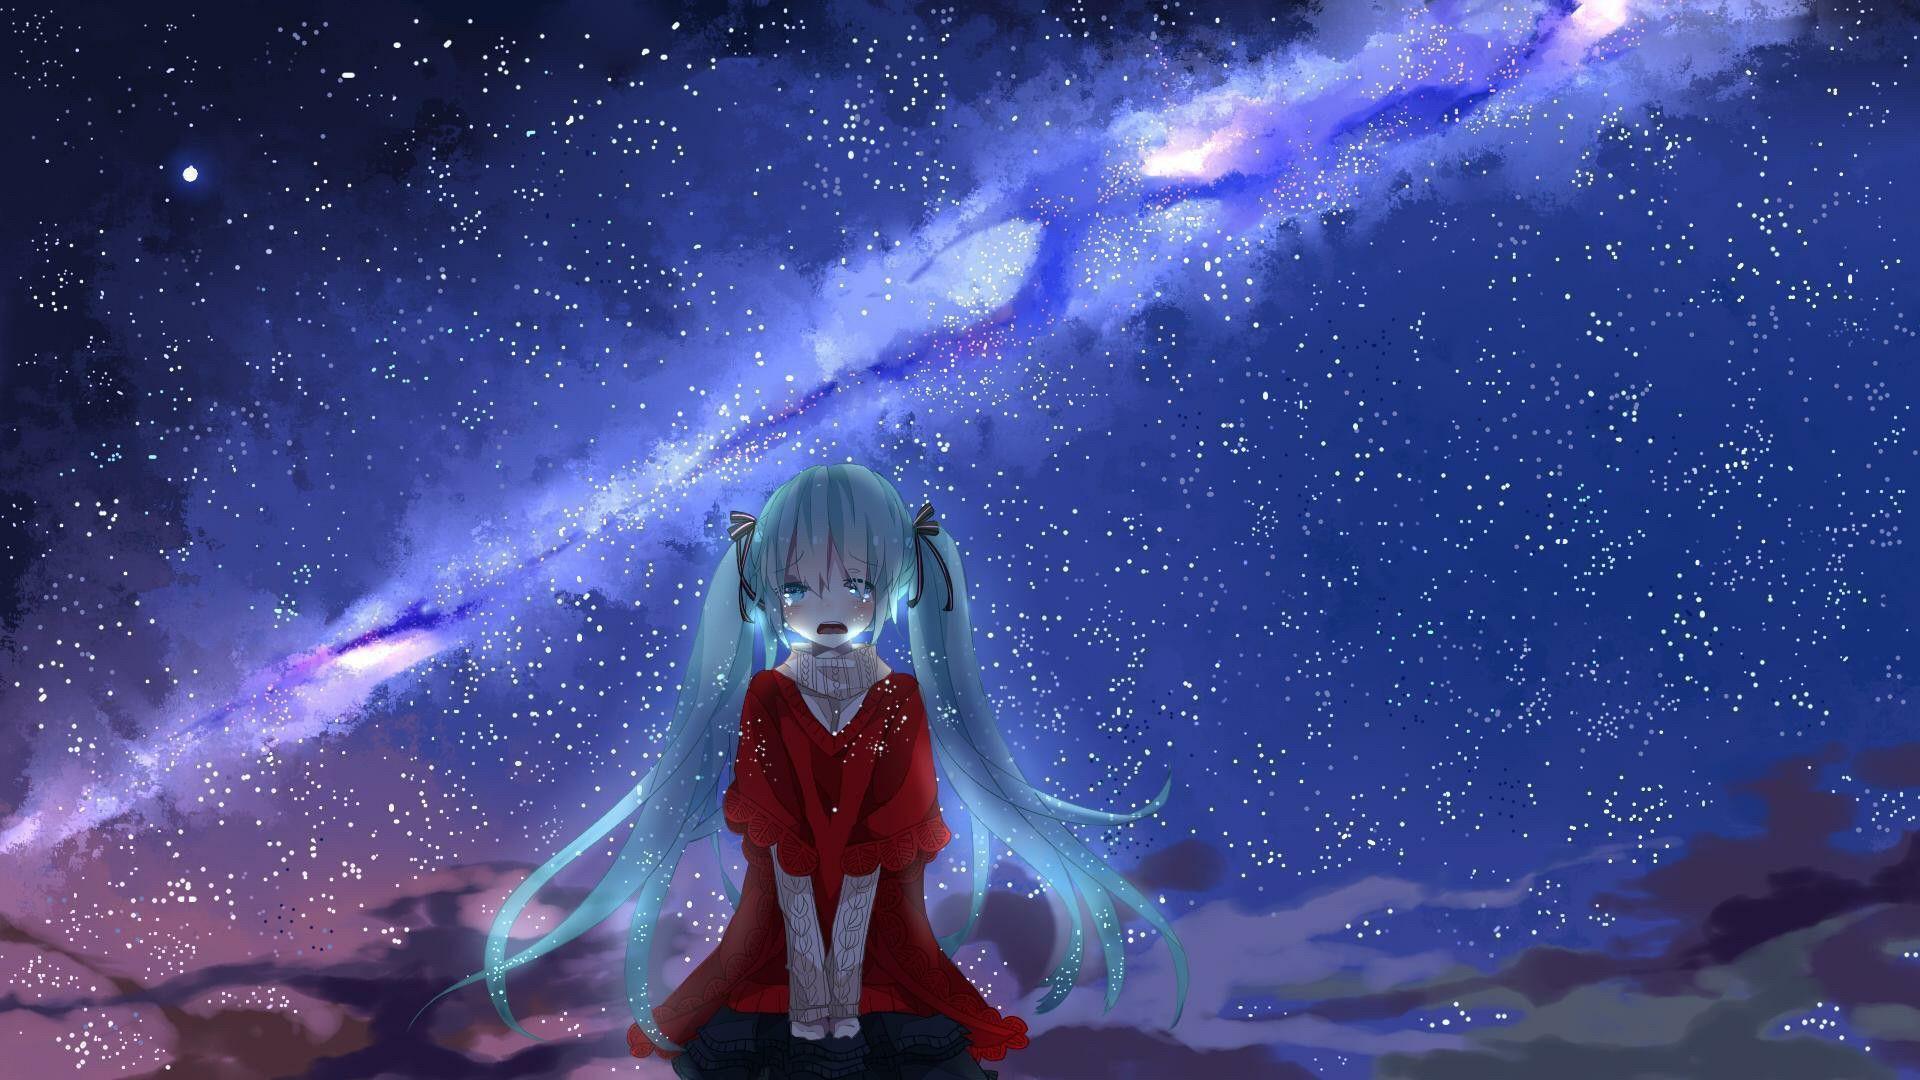 Hatsune Miku Gambar anime, Animasi